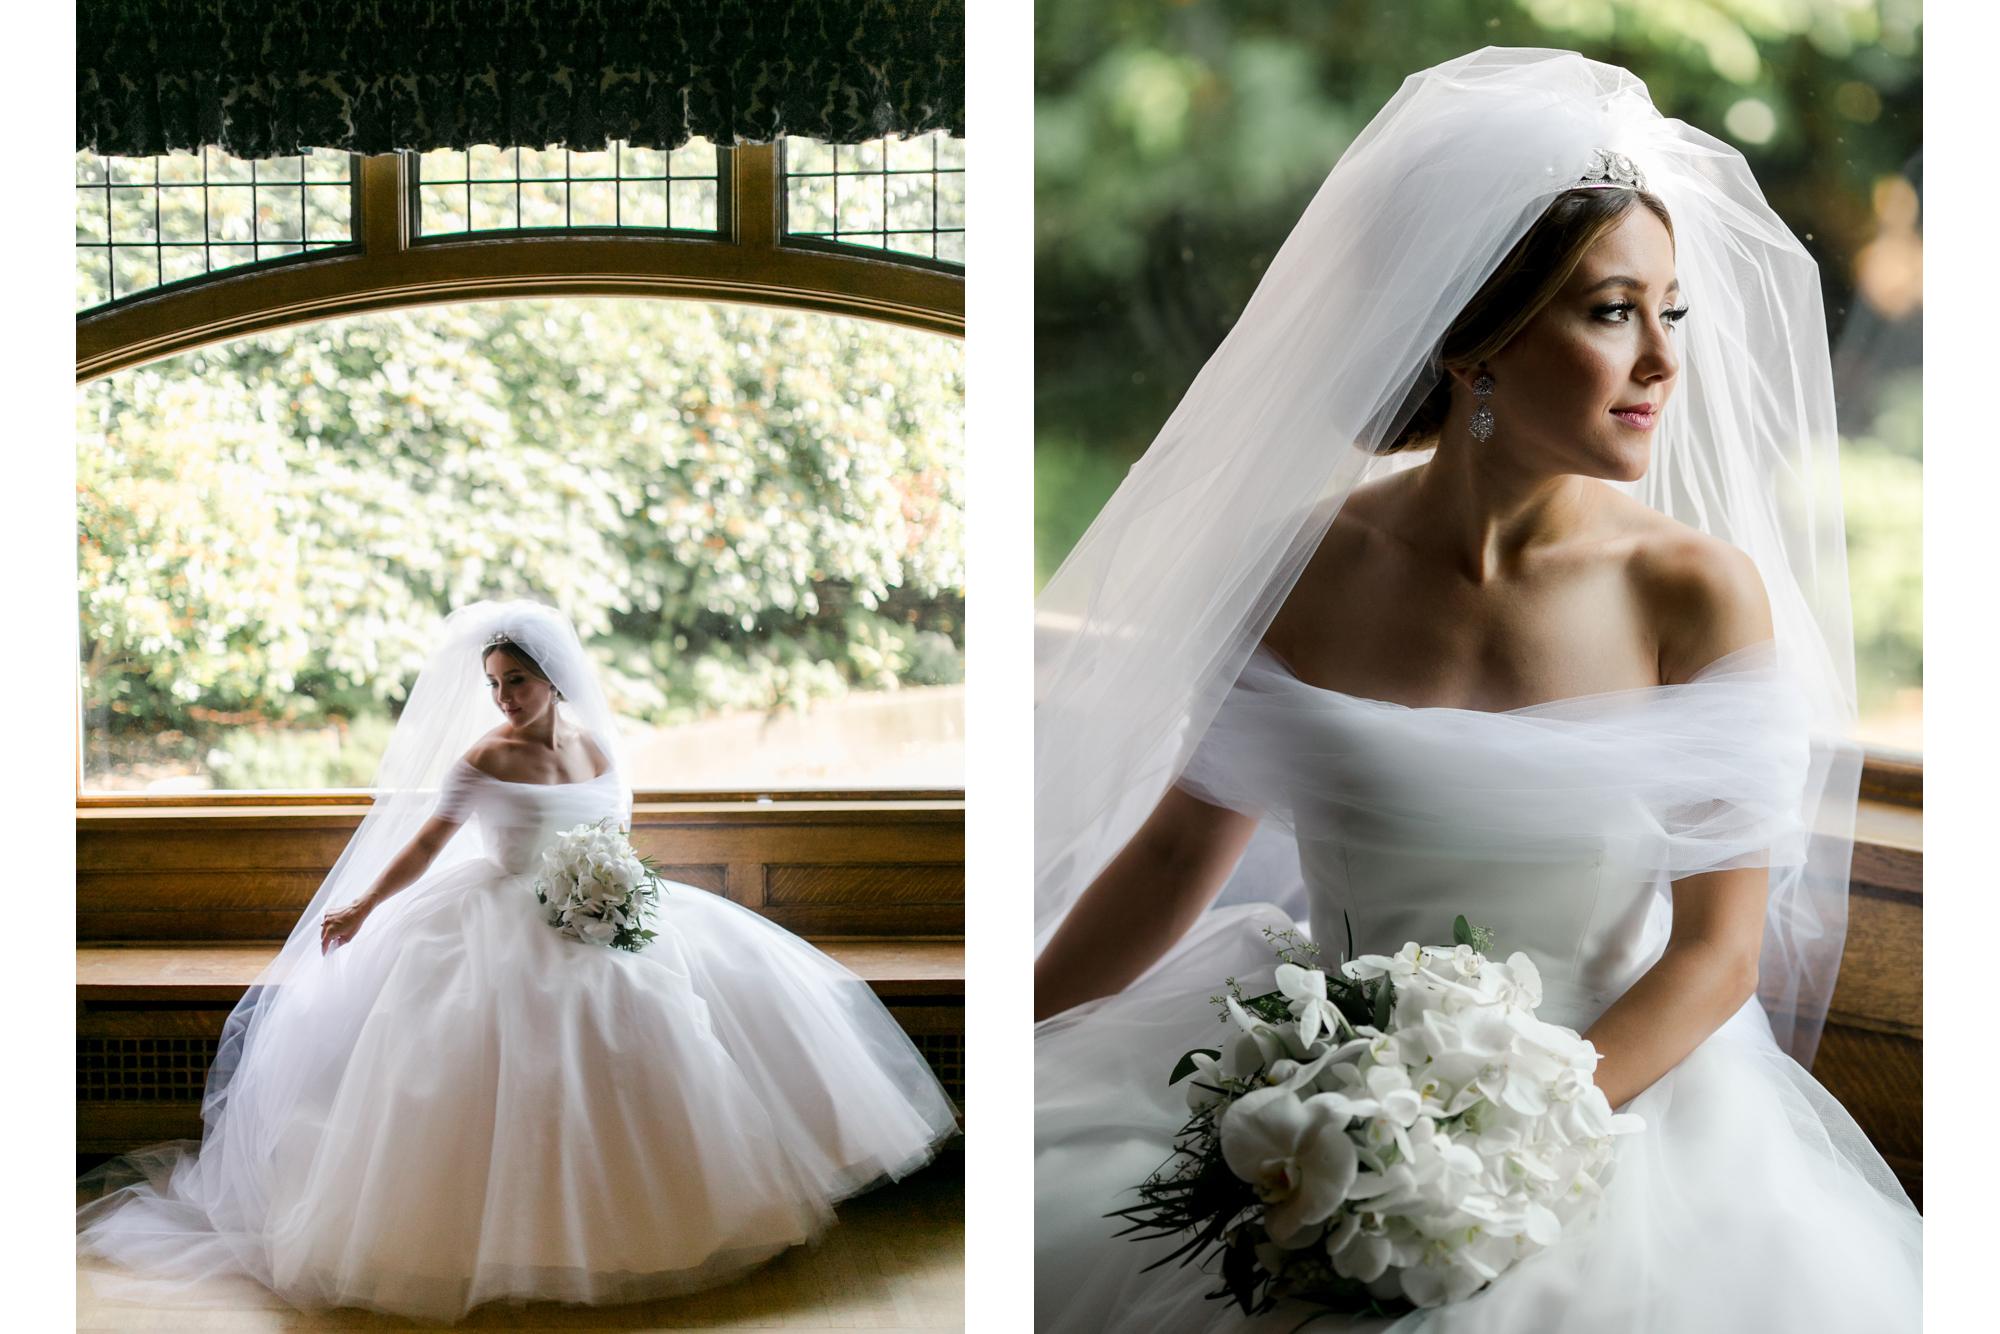 vancouver-luxury-wedding-photographer-lori-miles-31.jpg